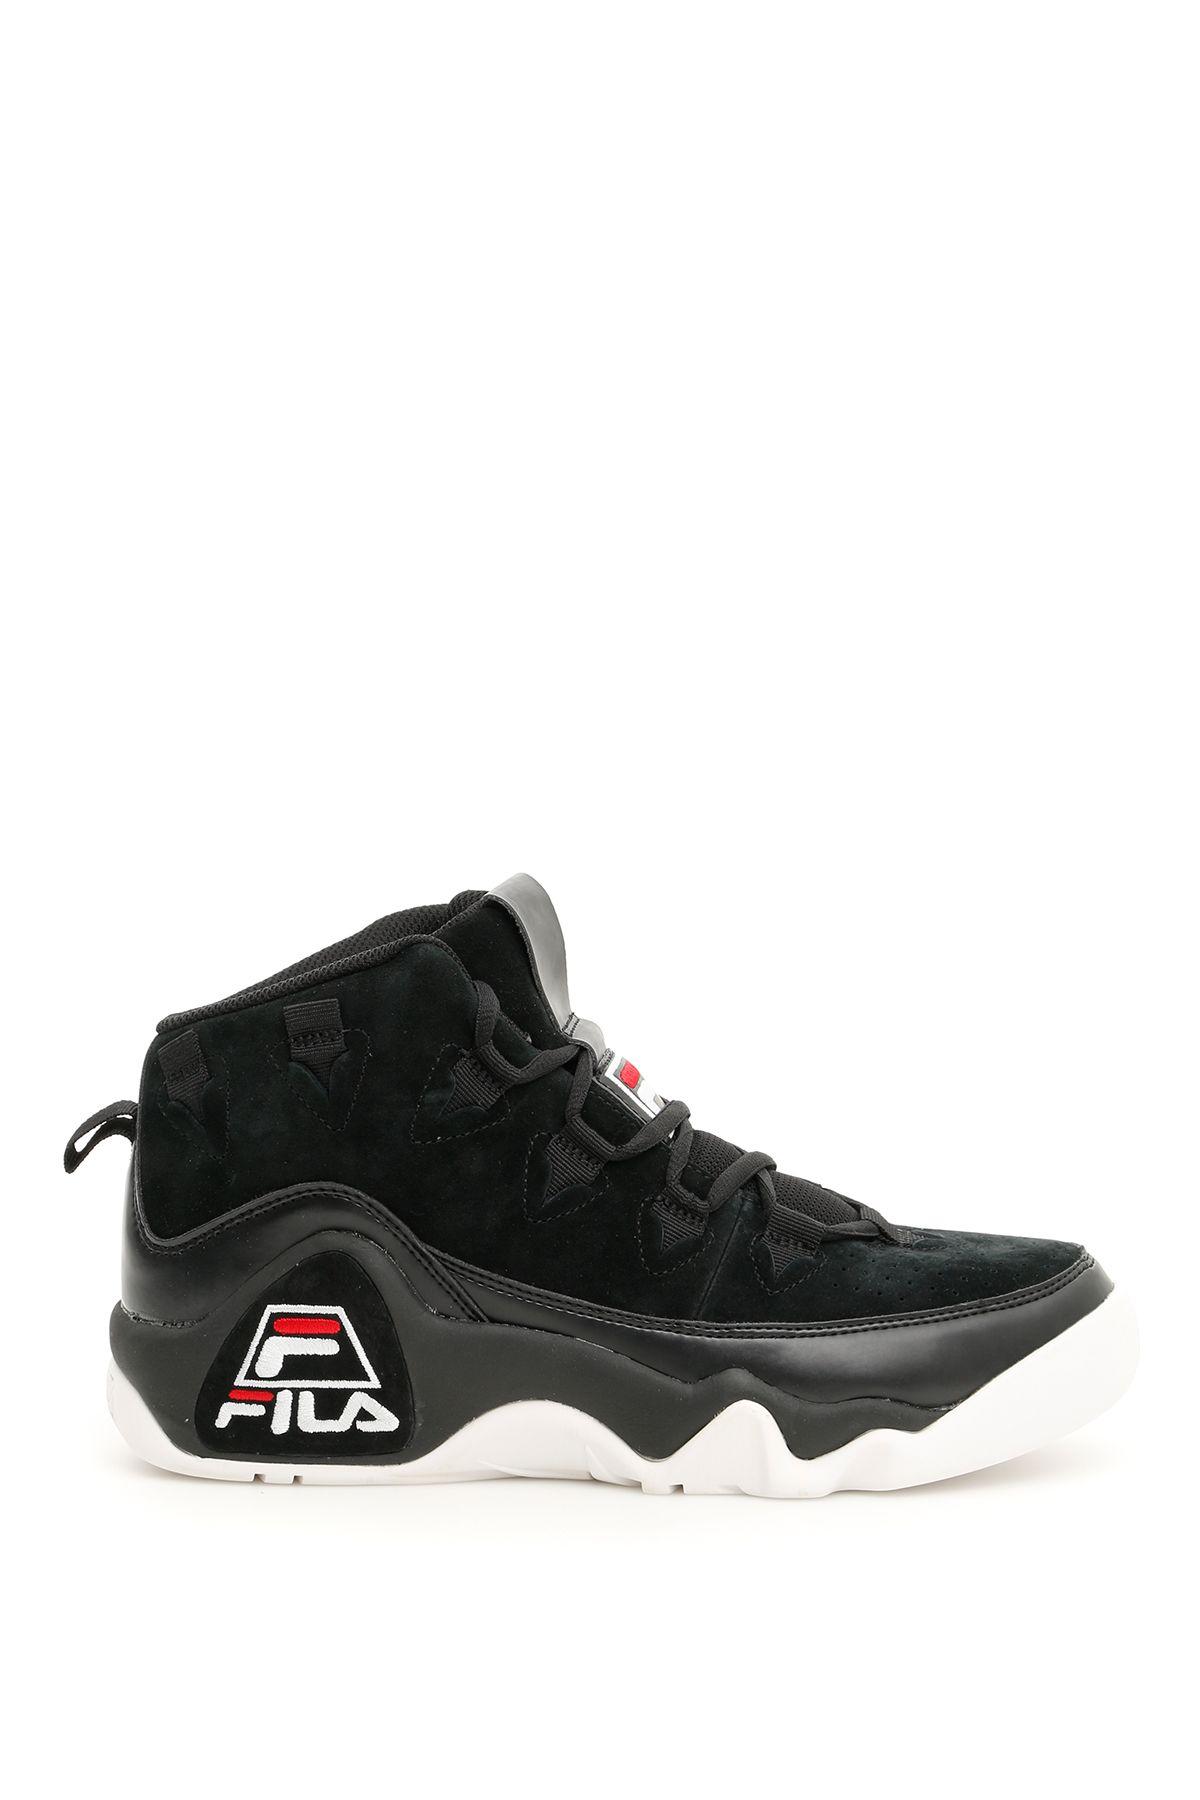 a5fecec57eb Fila Fila Grant Hill Sneakers - BLACK (Black) - 10717672 | italist